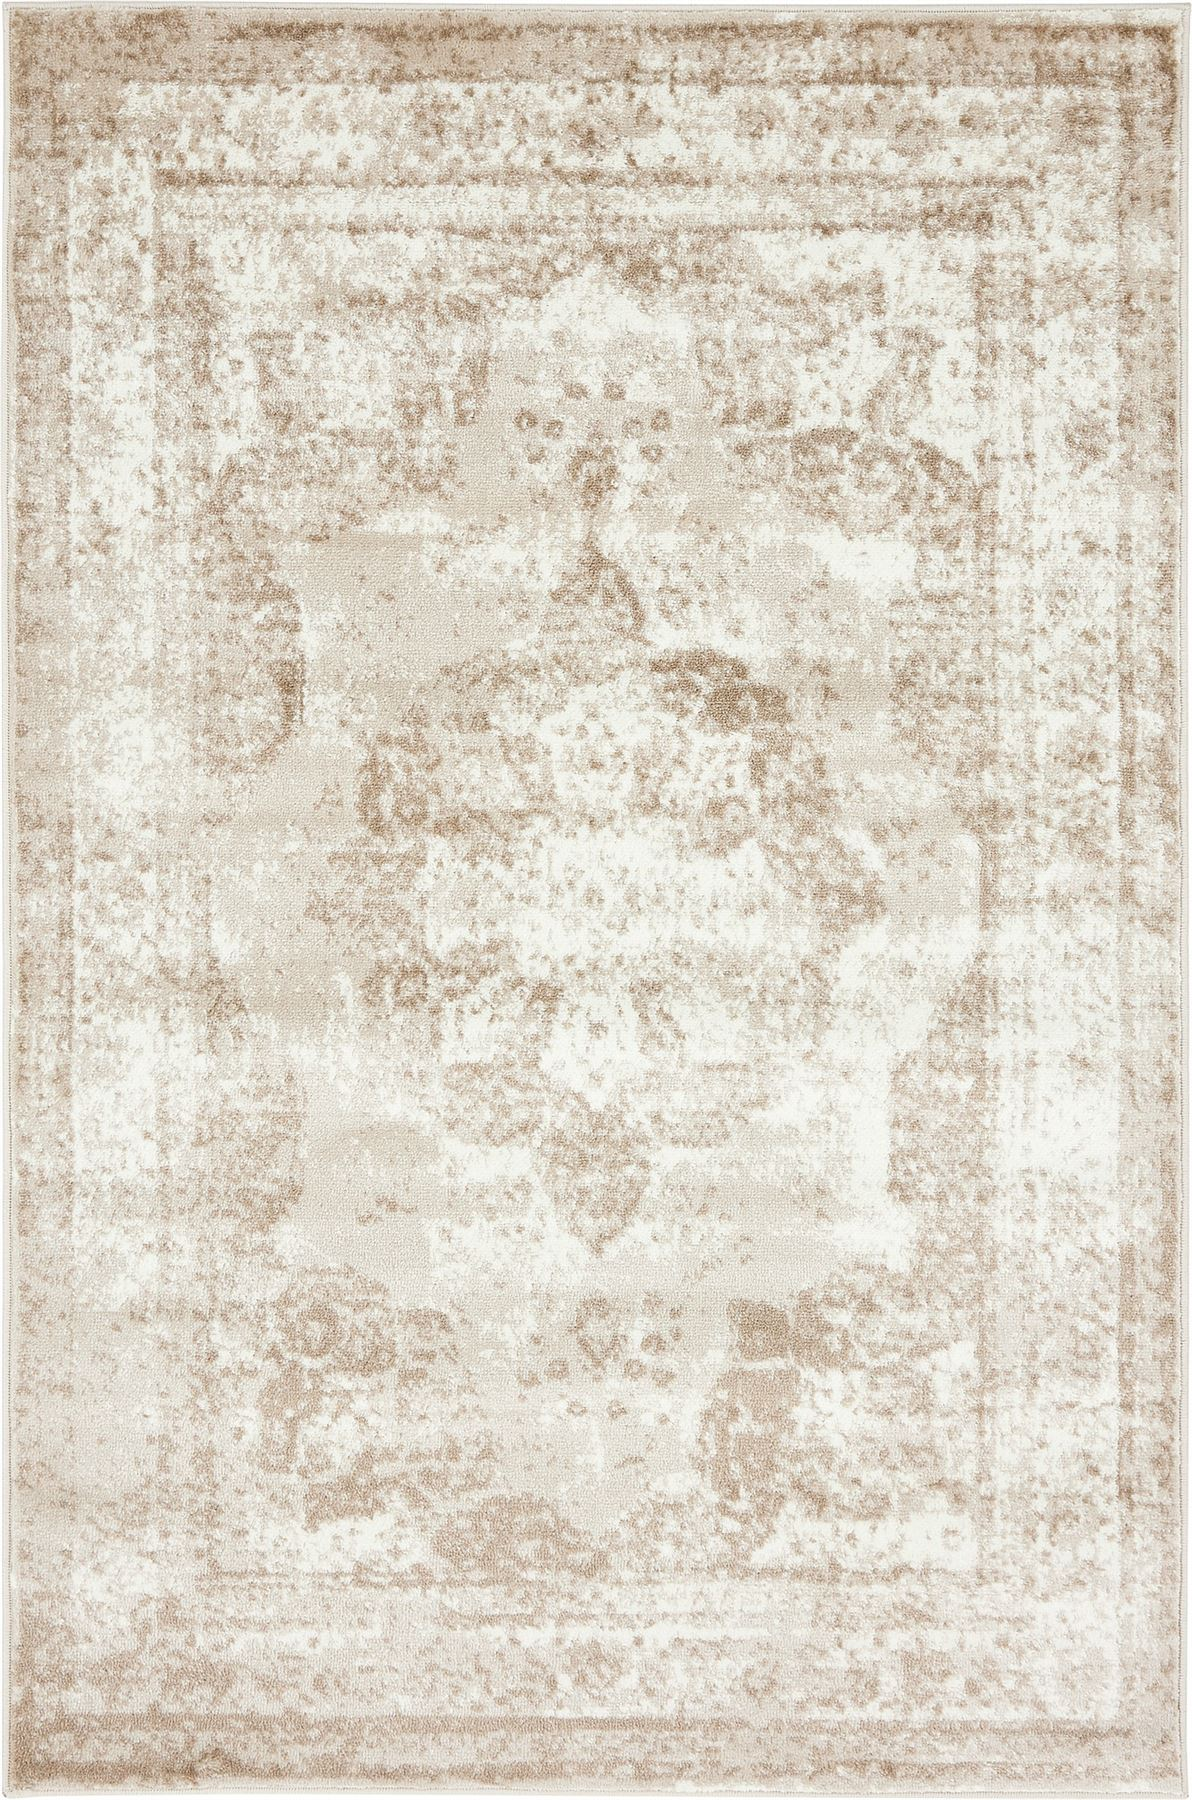 contemporary carpets oriental-persian-design-modern-carpet-contemporary-area-rug- PIZOQNP